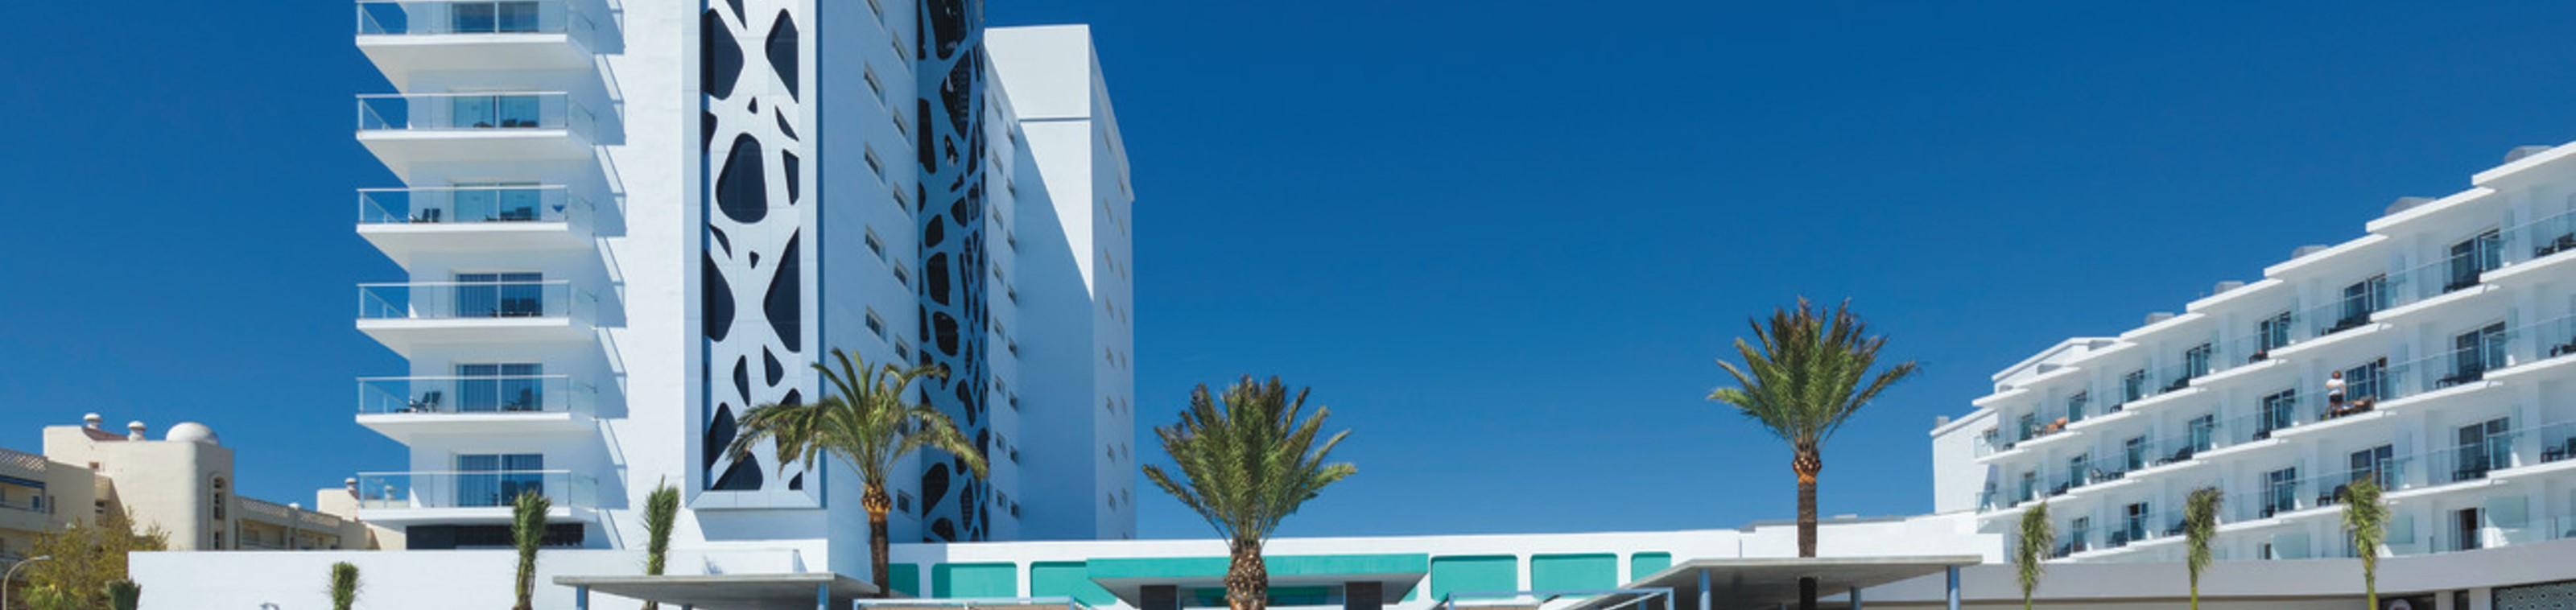 All Inclusive RIU hotel in Torremolinos